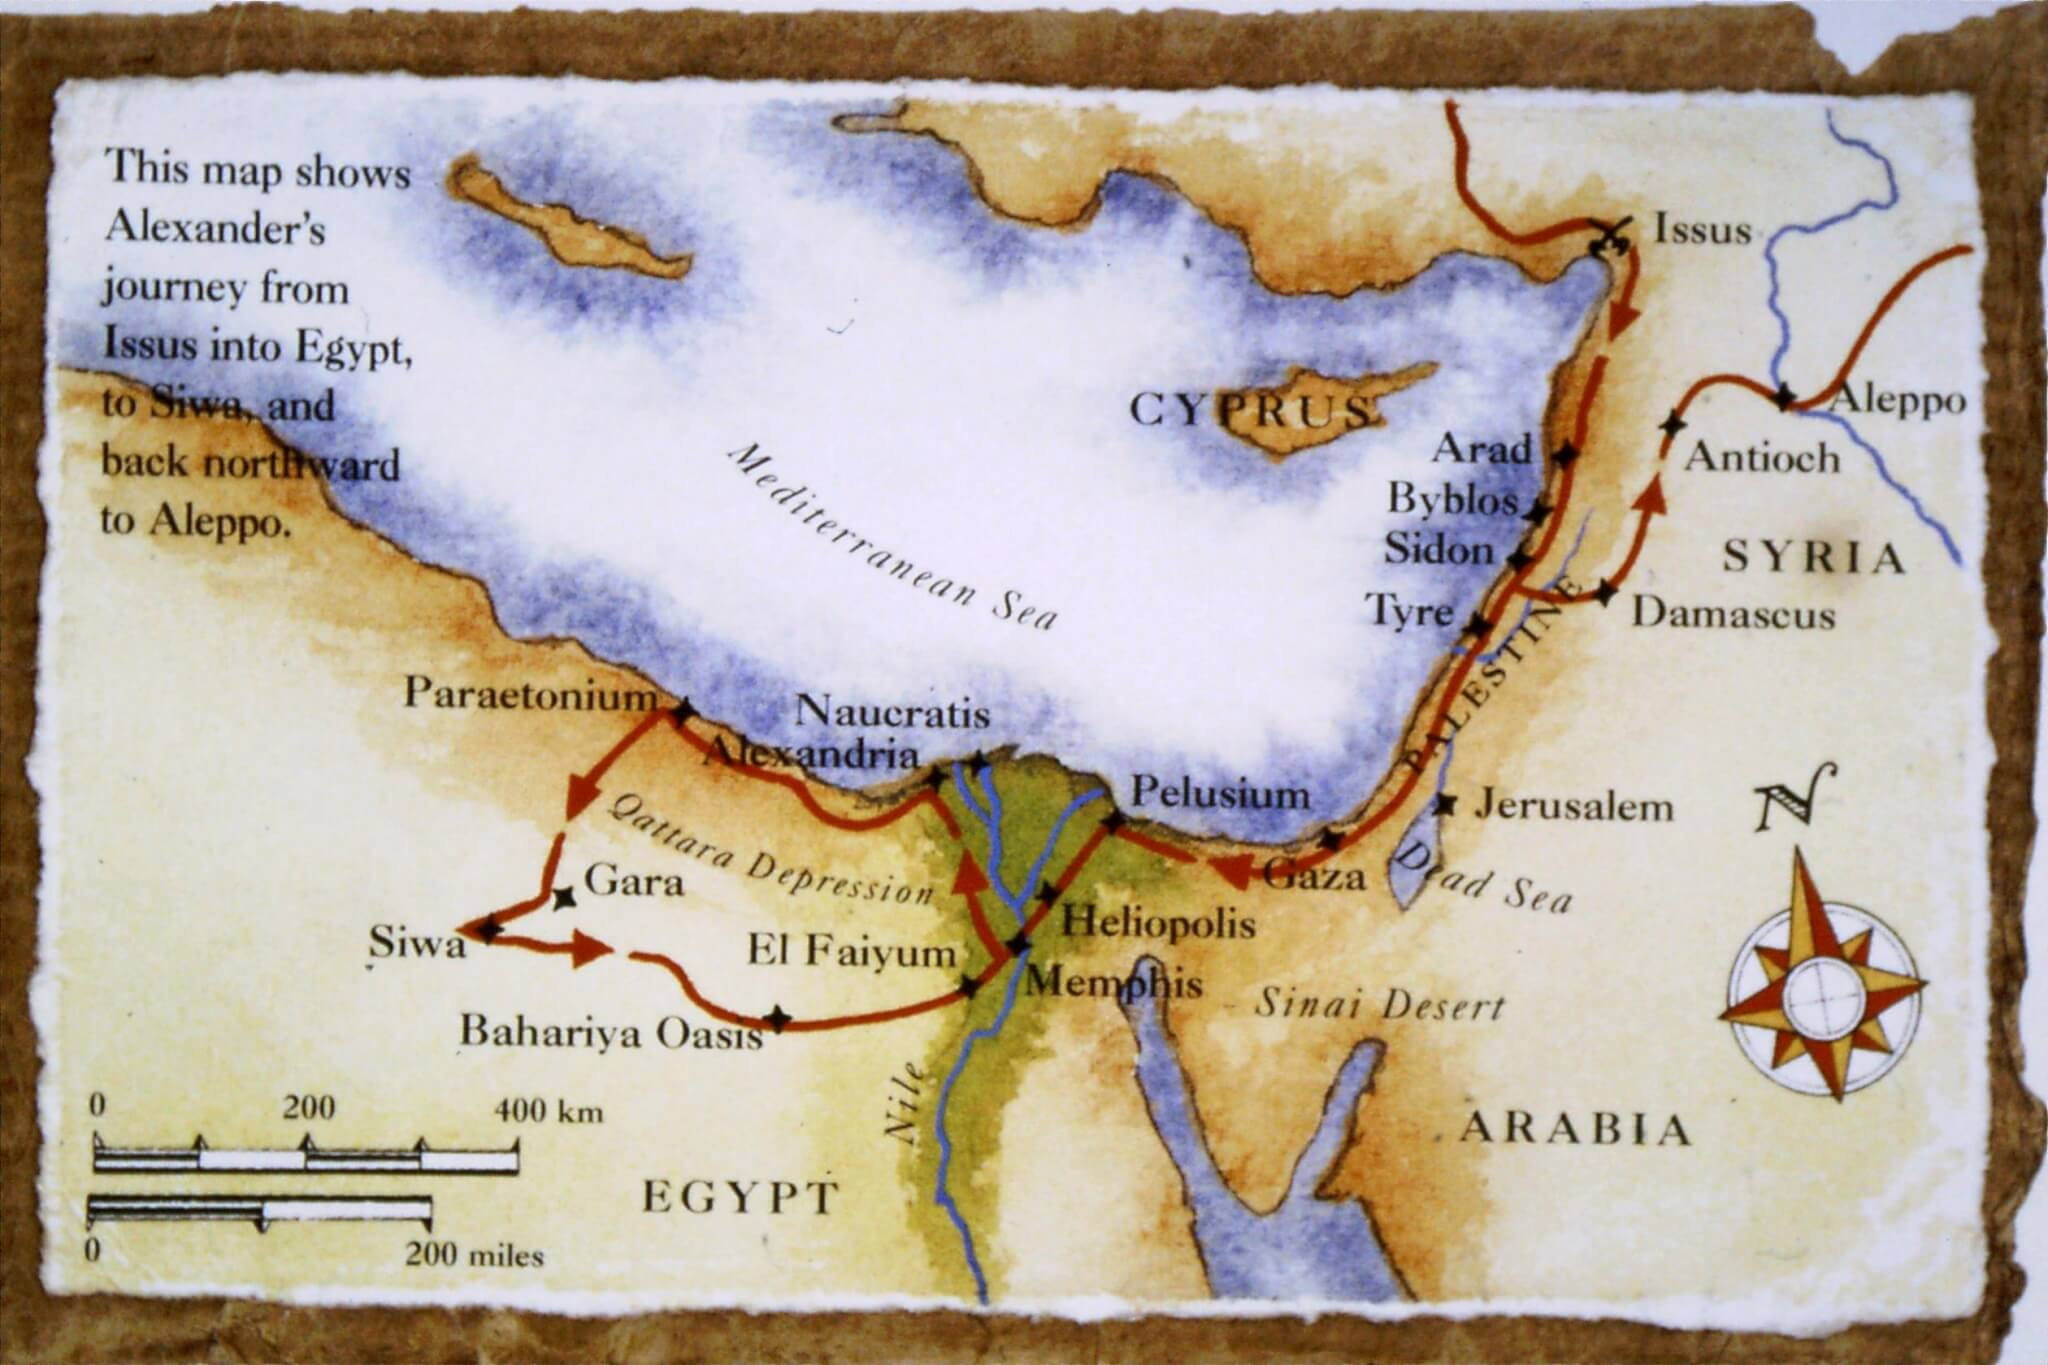 Siwa Alexander Route